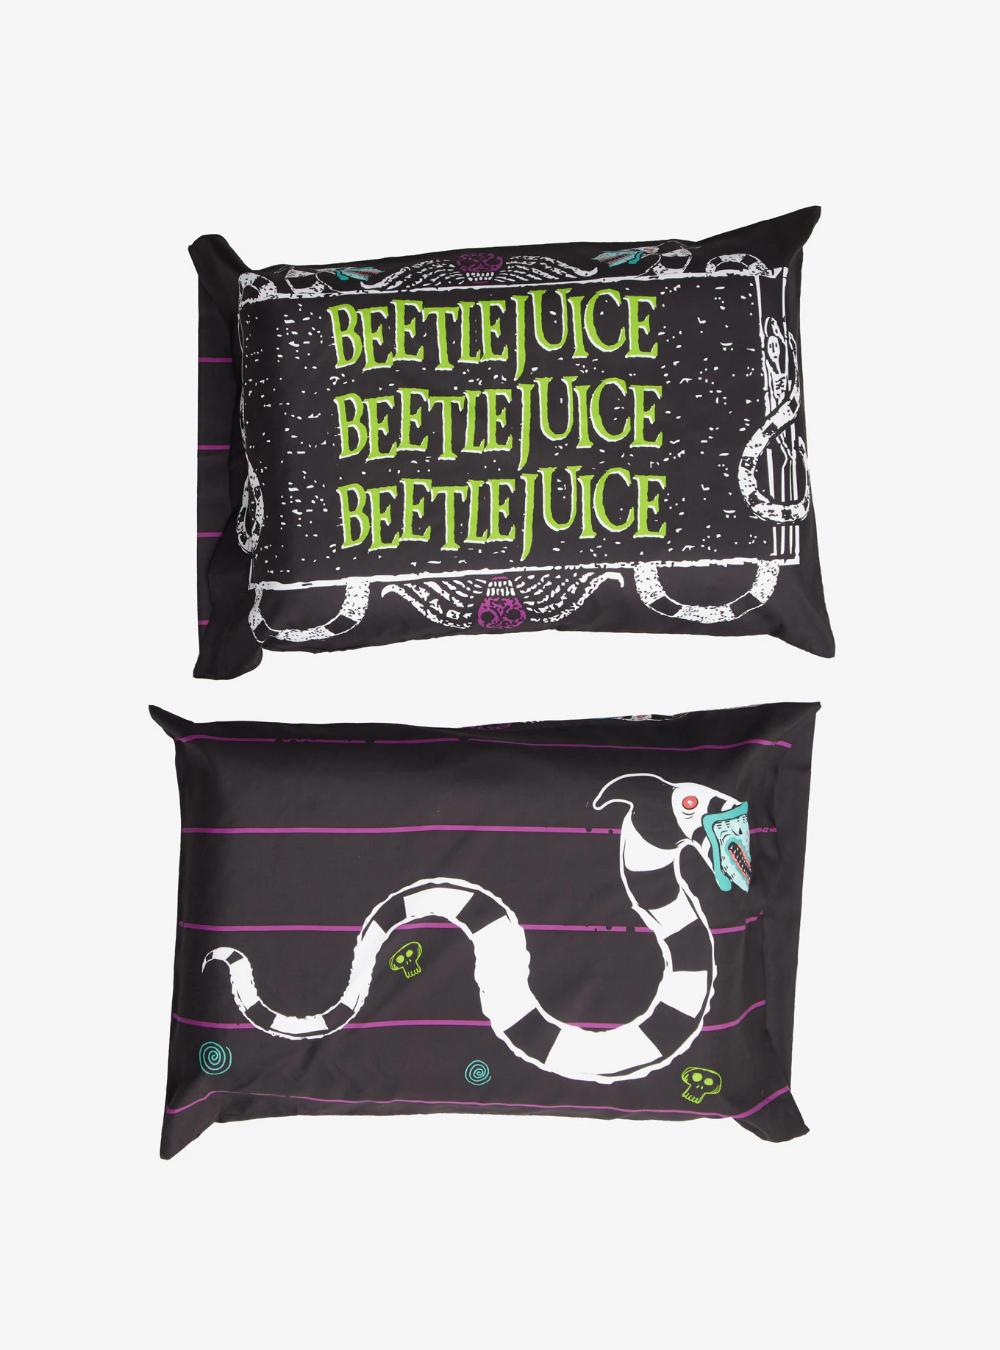 Beetlejuice Name & Sandworm Pillowcase Set